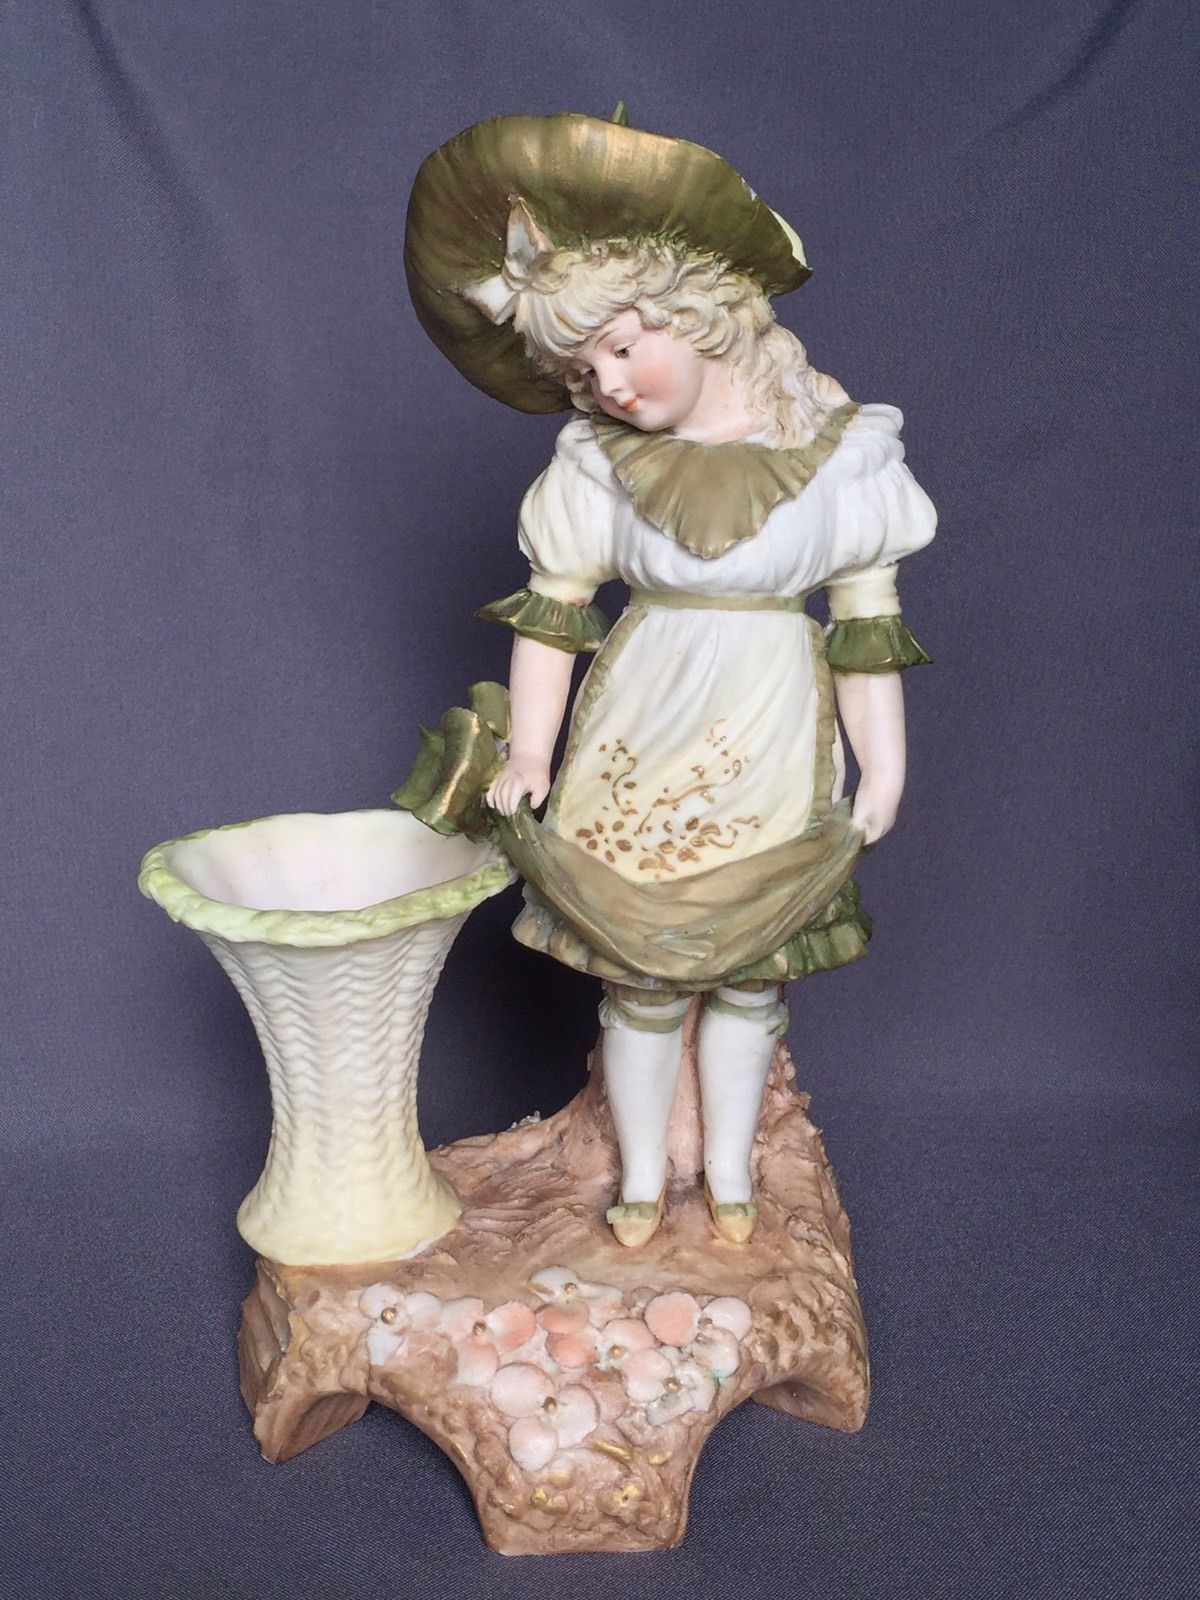 Gorgeous antique ernst wahliss teplitz amphora victorian porcelain gorgeous antique ernst wahliss teplitz amphora victorian porcelain figurine vase ebay reviewsmspy